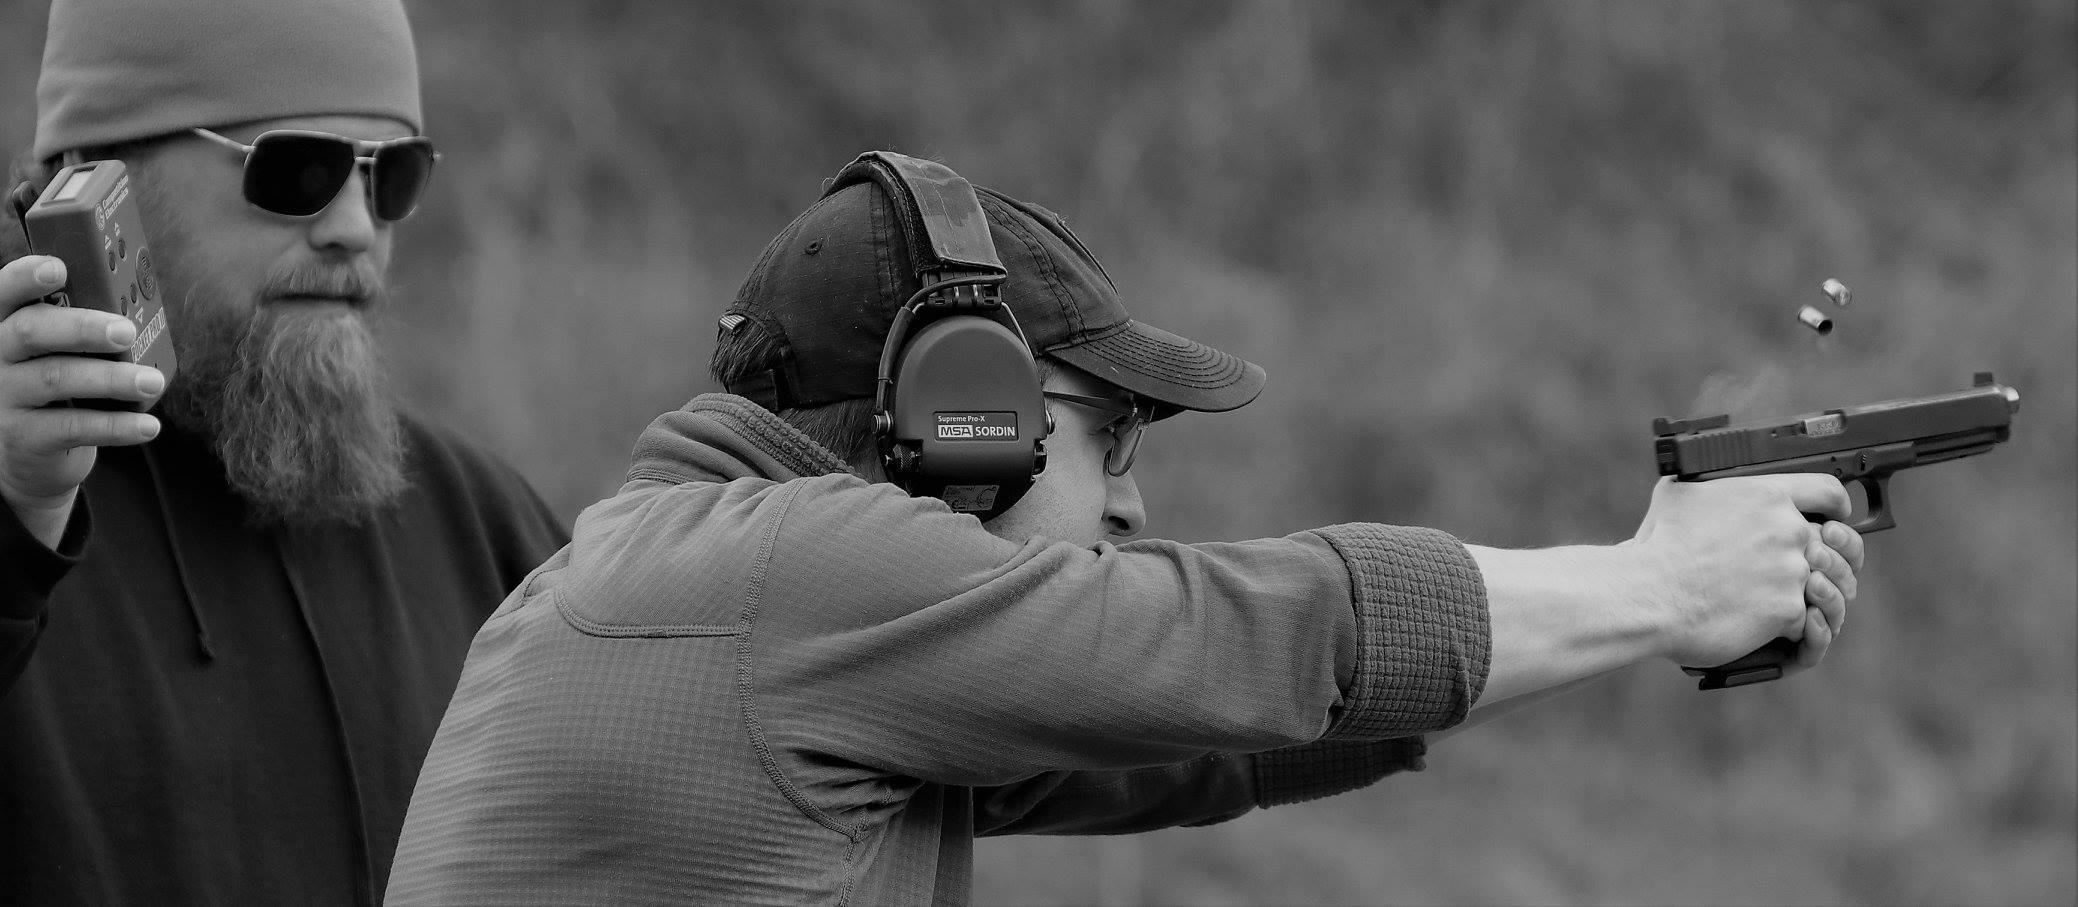 origin-wv-pistol-class.jpg